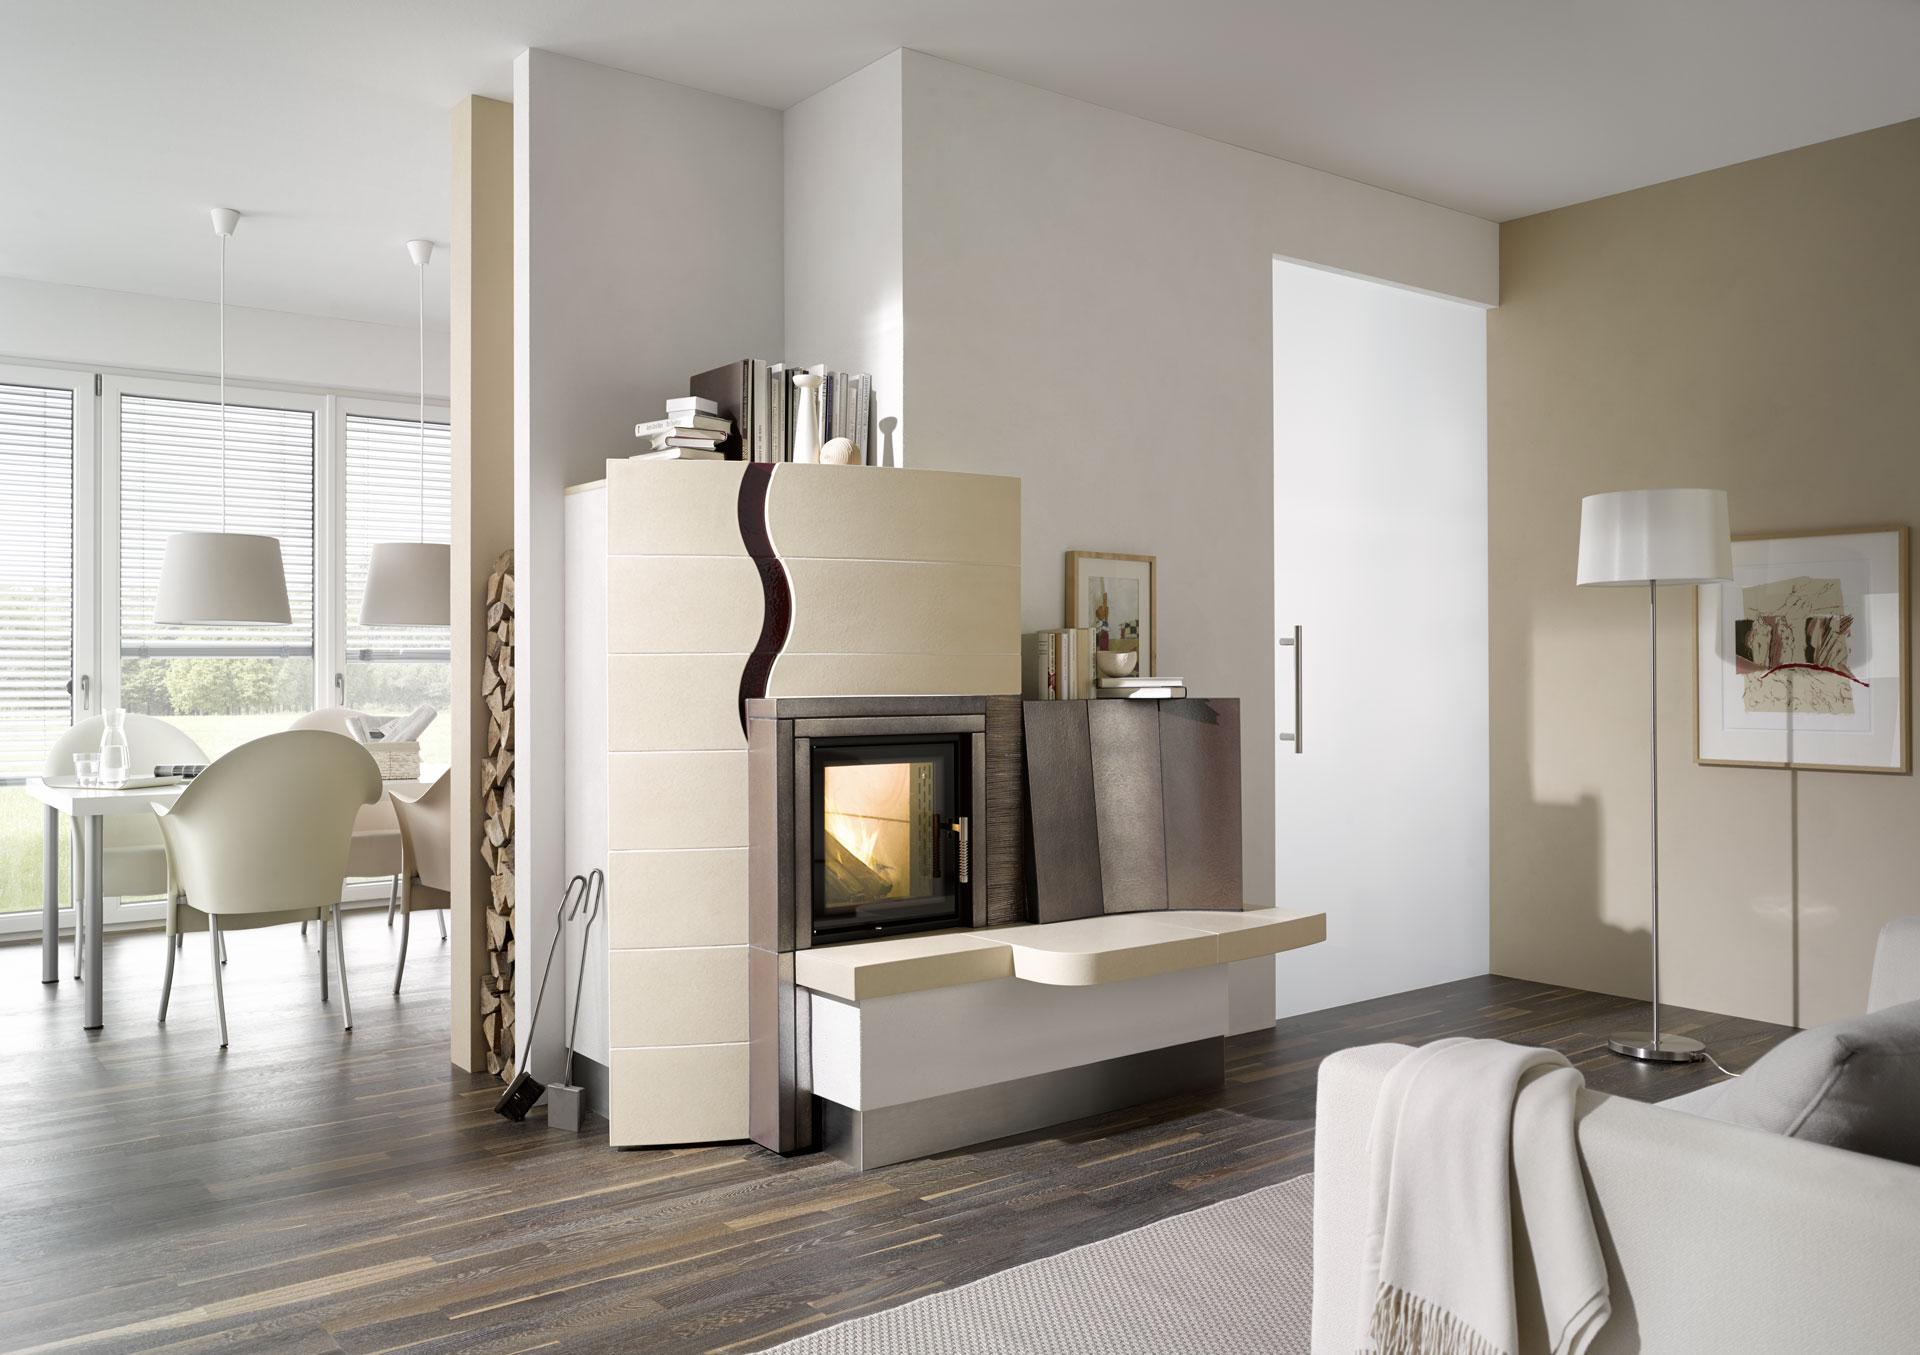 kachelofen bilder kachelofentraum. Black Bedroom Furniture Sets. Home Design Ideas